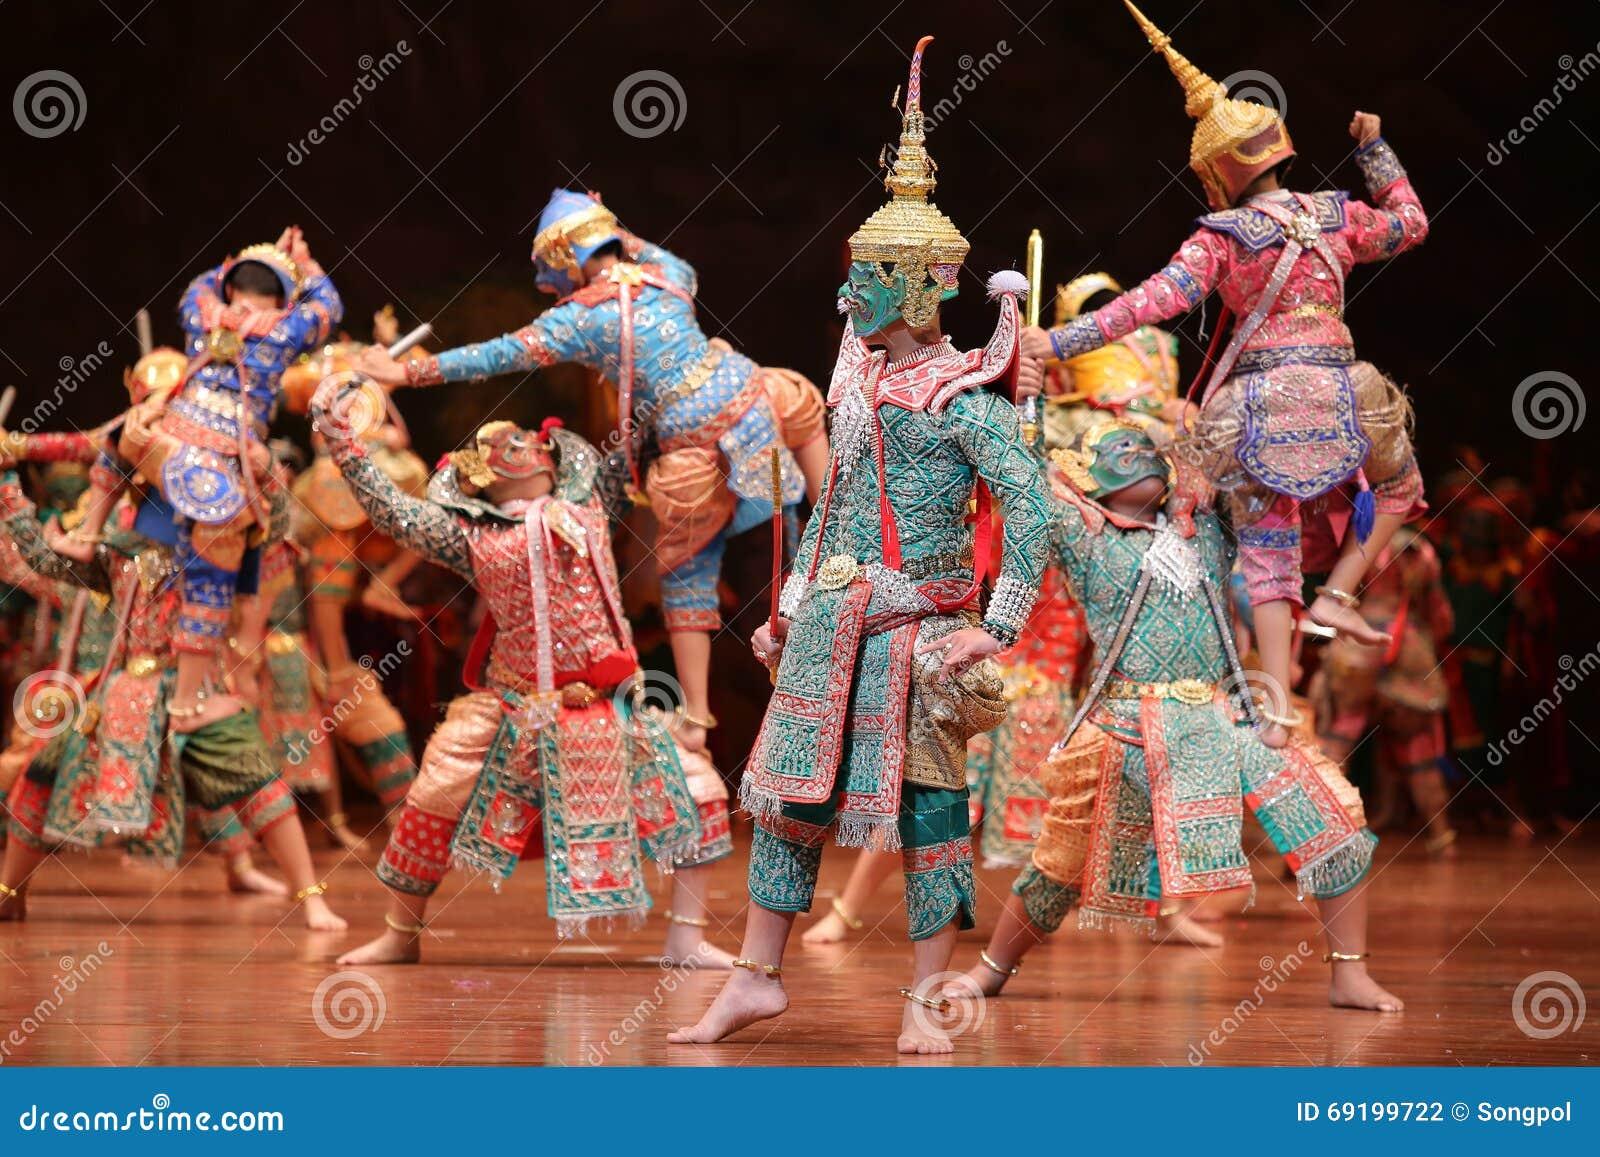 Khon, Dance Drama From Thailand  Stock Photo - Image of